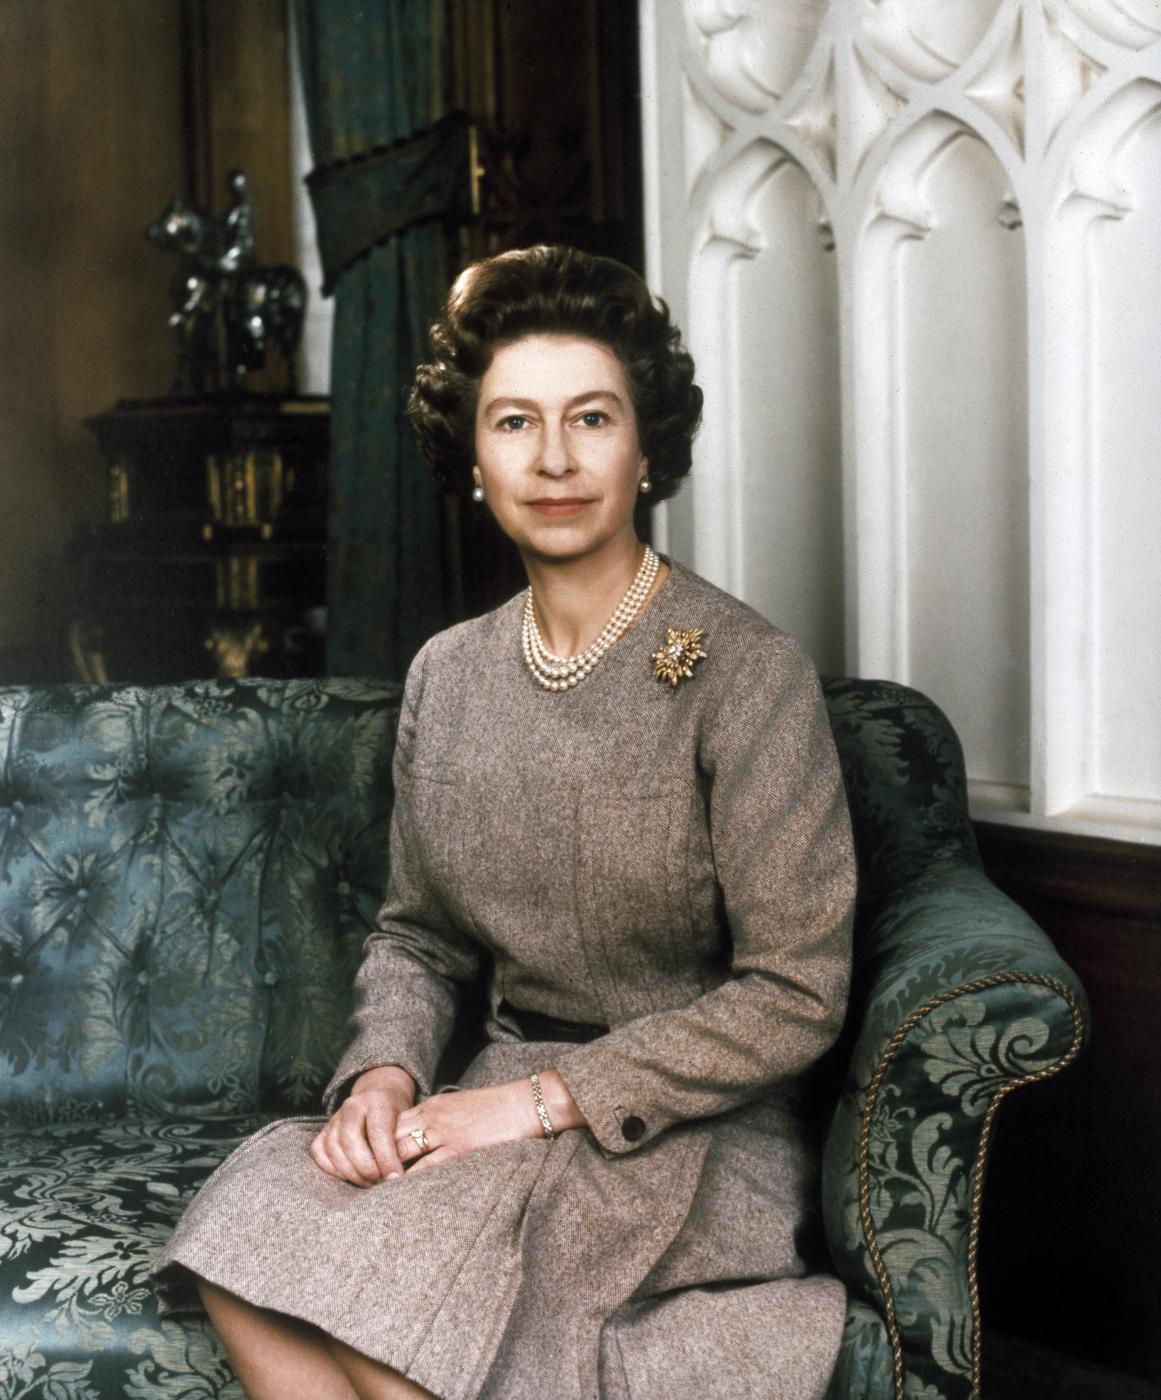 Domani la regina elisabetta ii compie 90 anni ecco 10 for La regina elisabetta 2